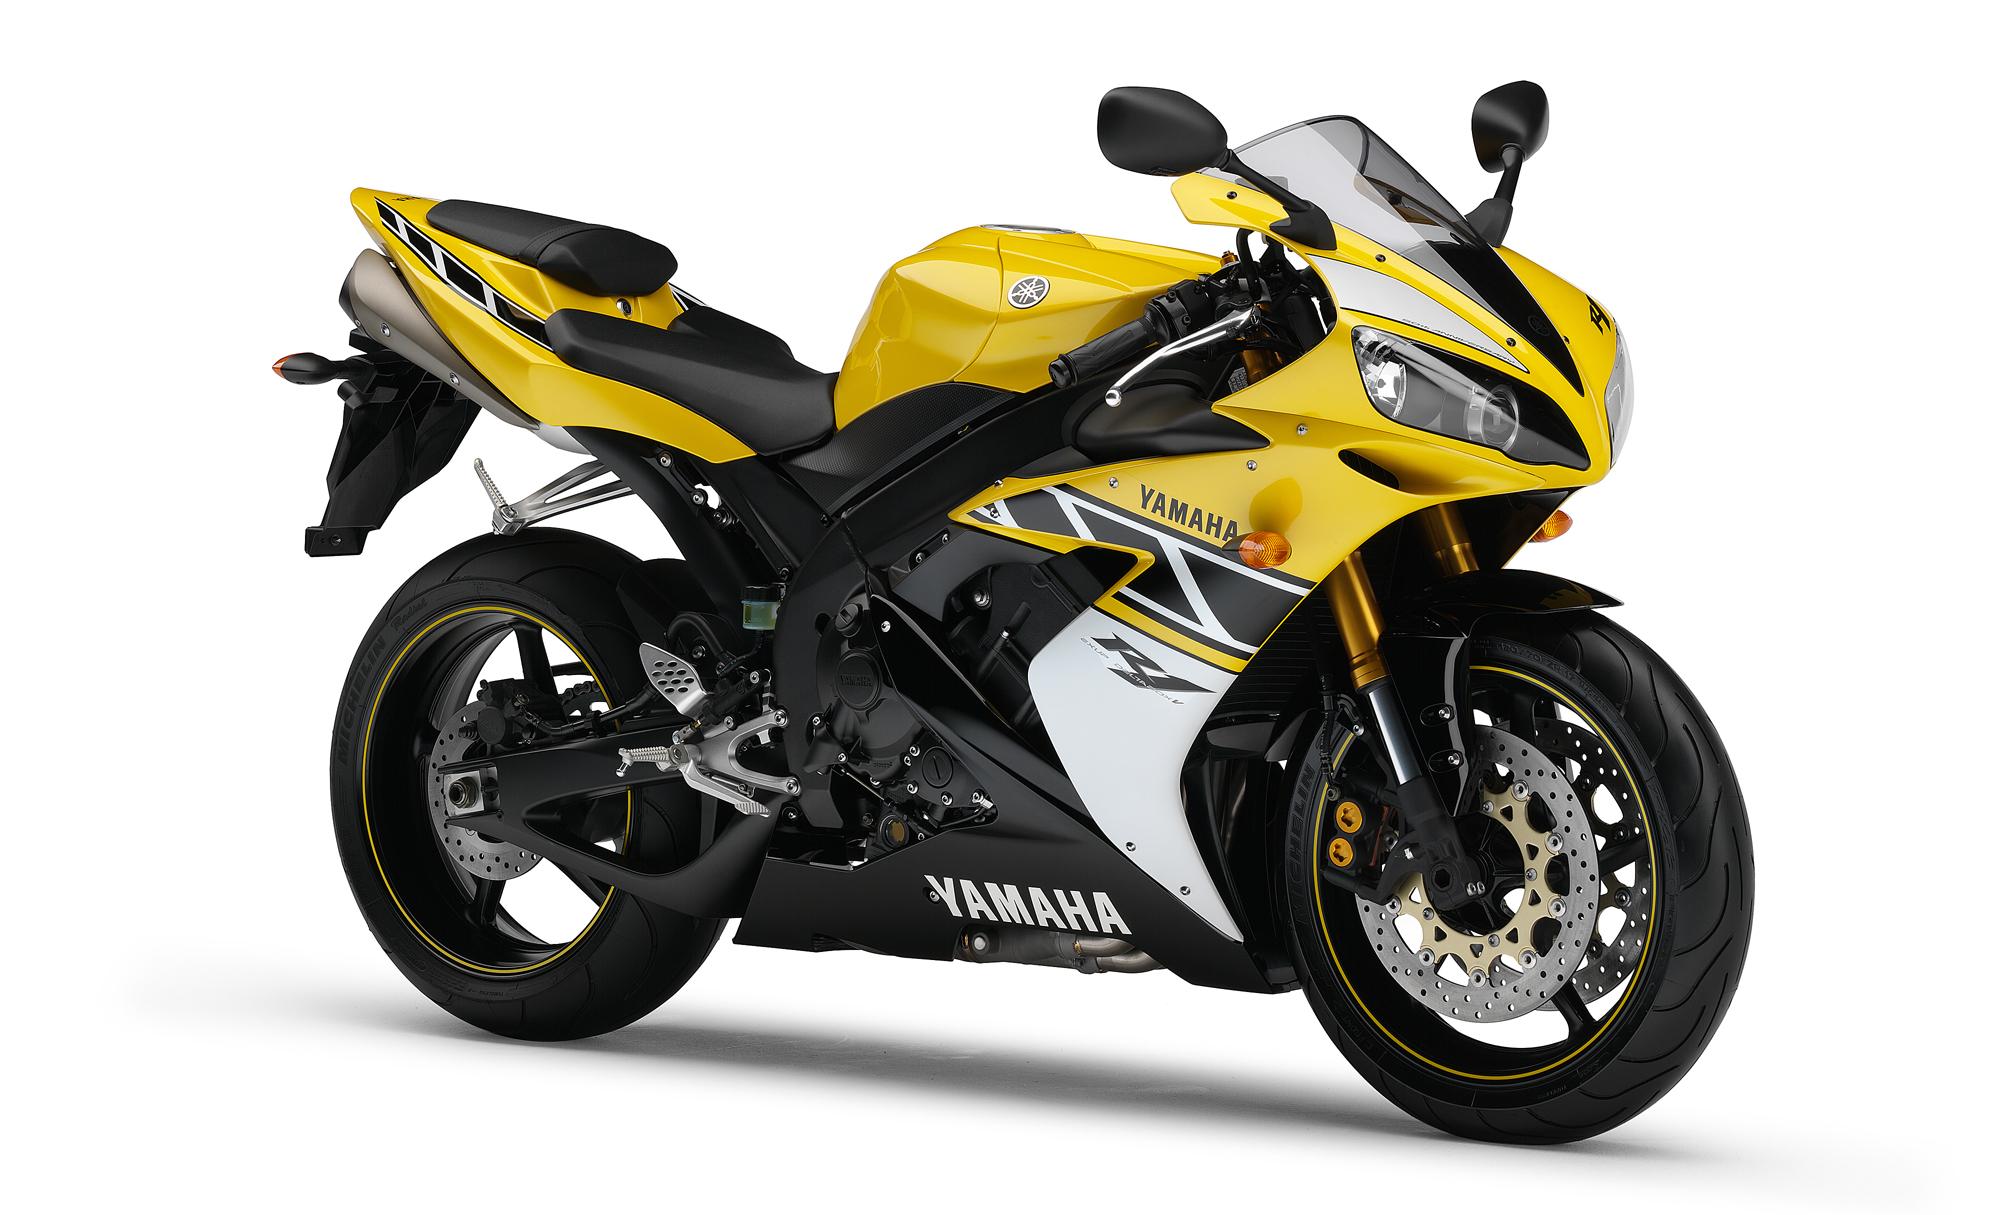 2006 R1 Extreme Yellow Ryc1 Yamaha Yzf Super Bikes Yamaha Yzf R1